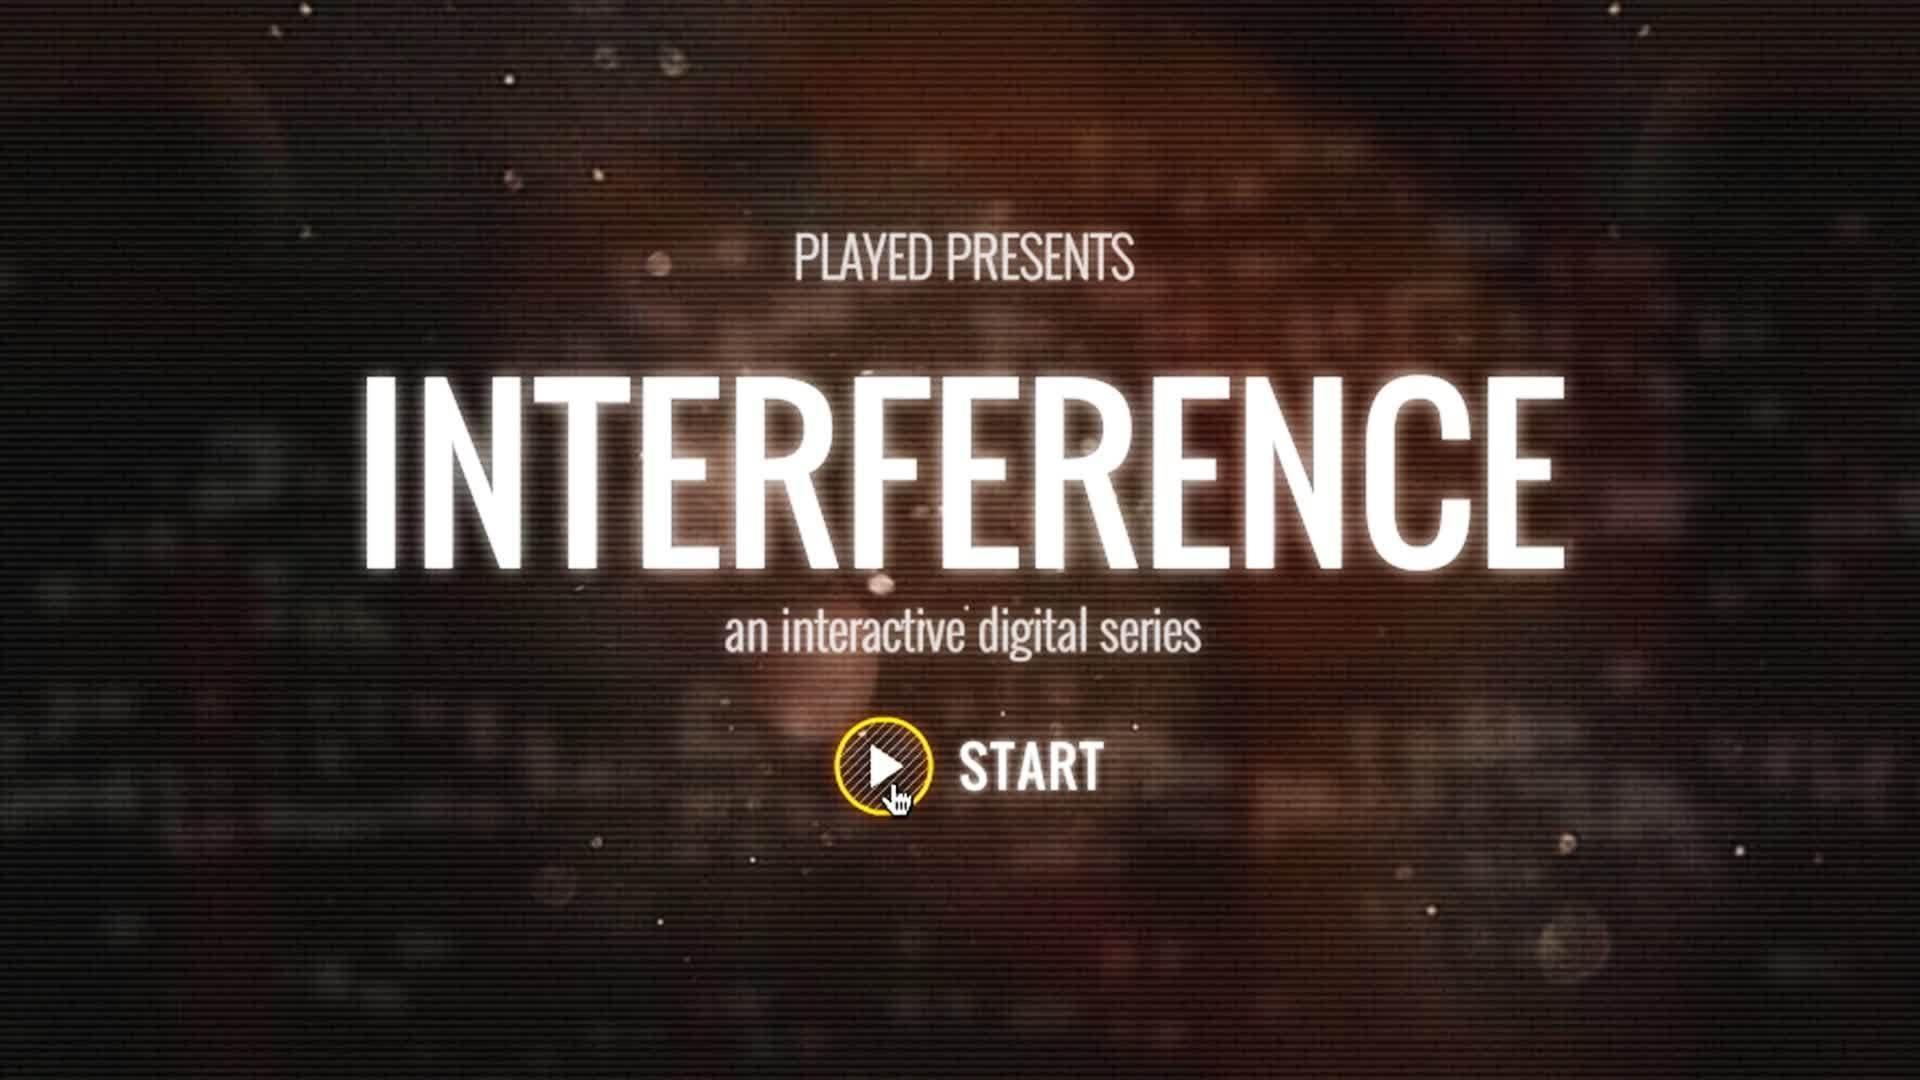 Webby Award Nominee - Interference